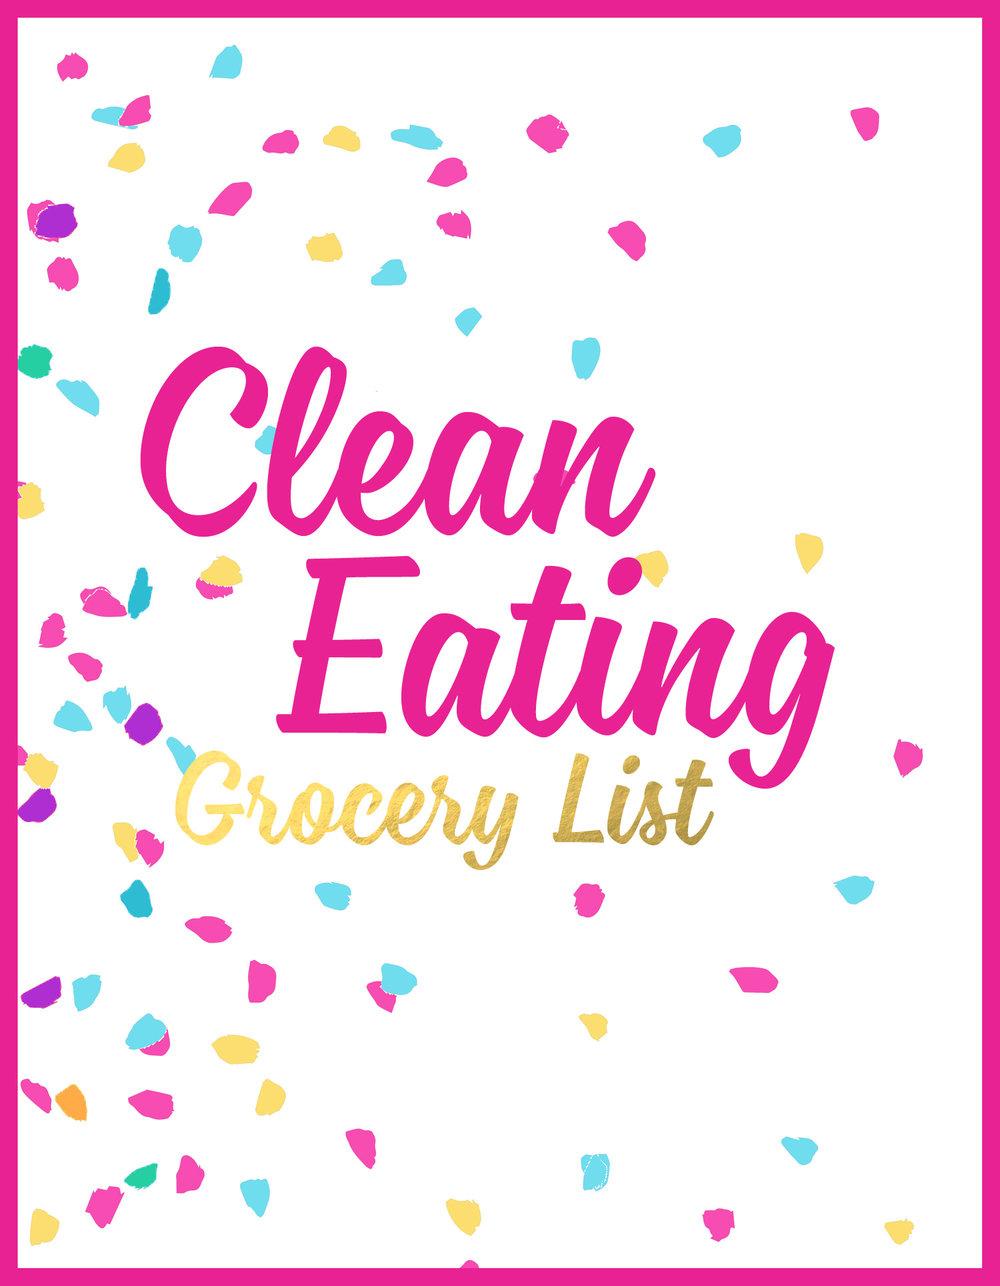 Julia Jackson - Get My Clean Eating Grocery List!